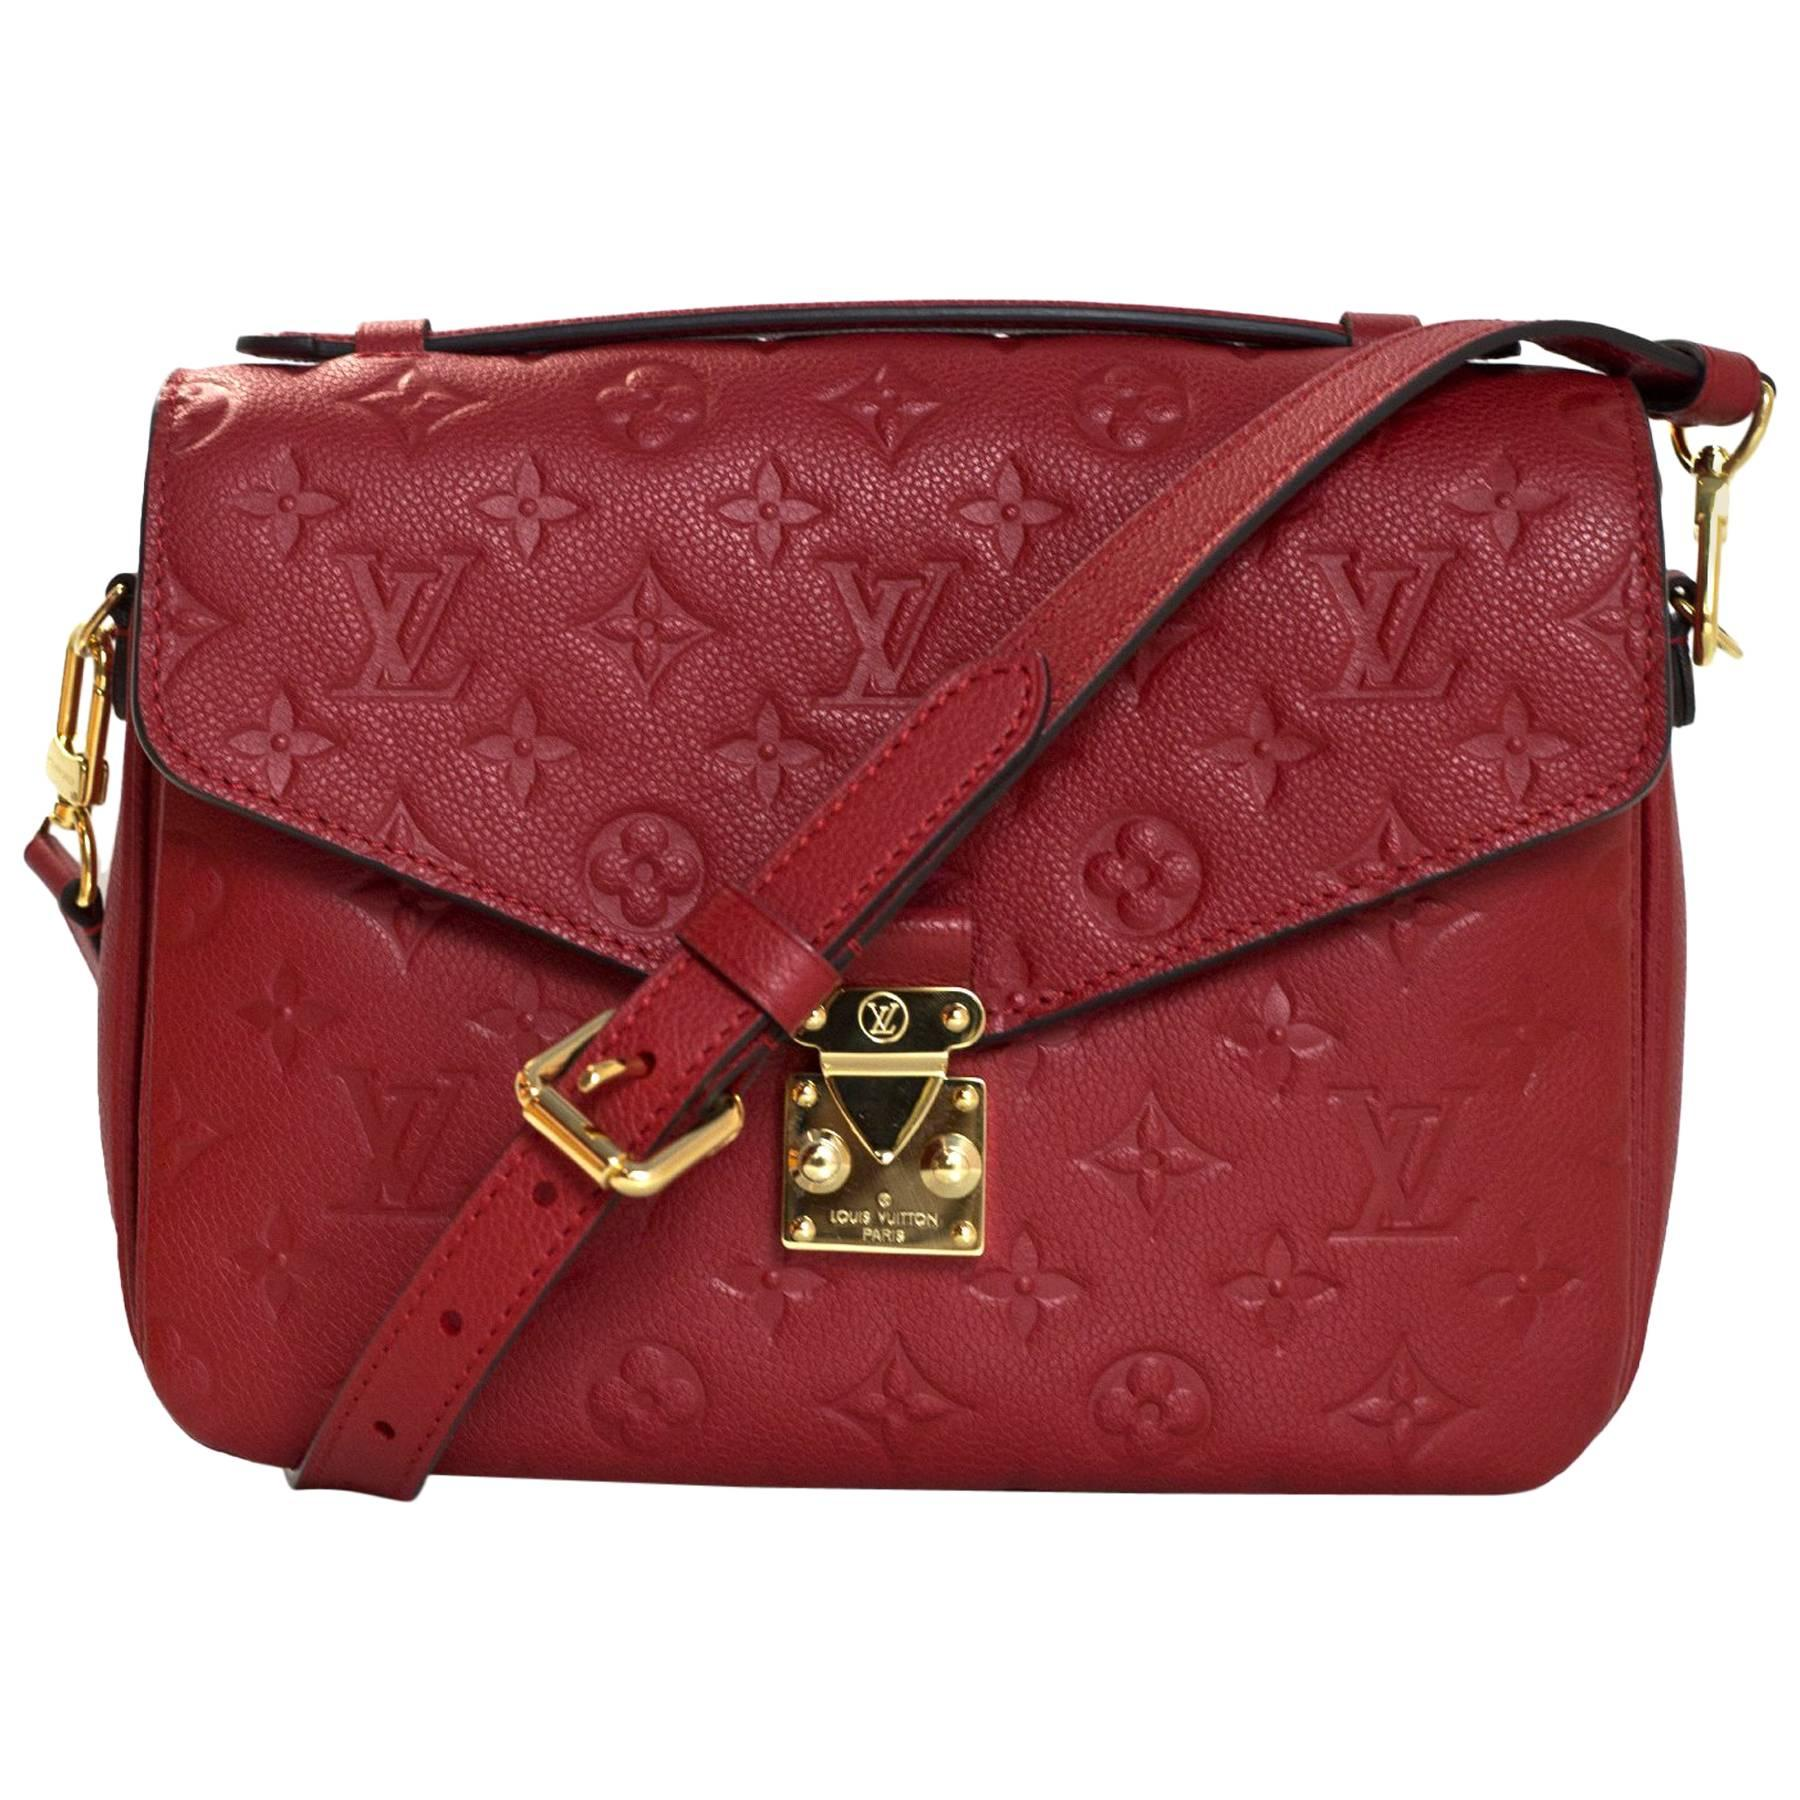 Louis Vuitton 2017 Cerise Red Empreinte Metis Pochette Crossbody Bag W. Dust Bag fcEe0exs